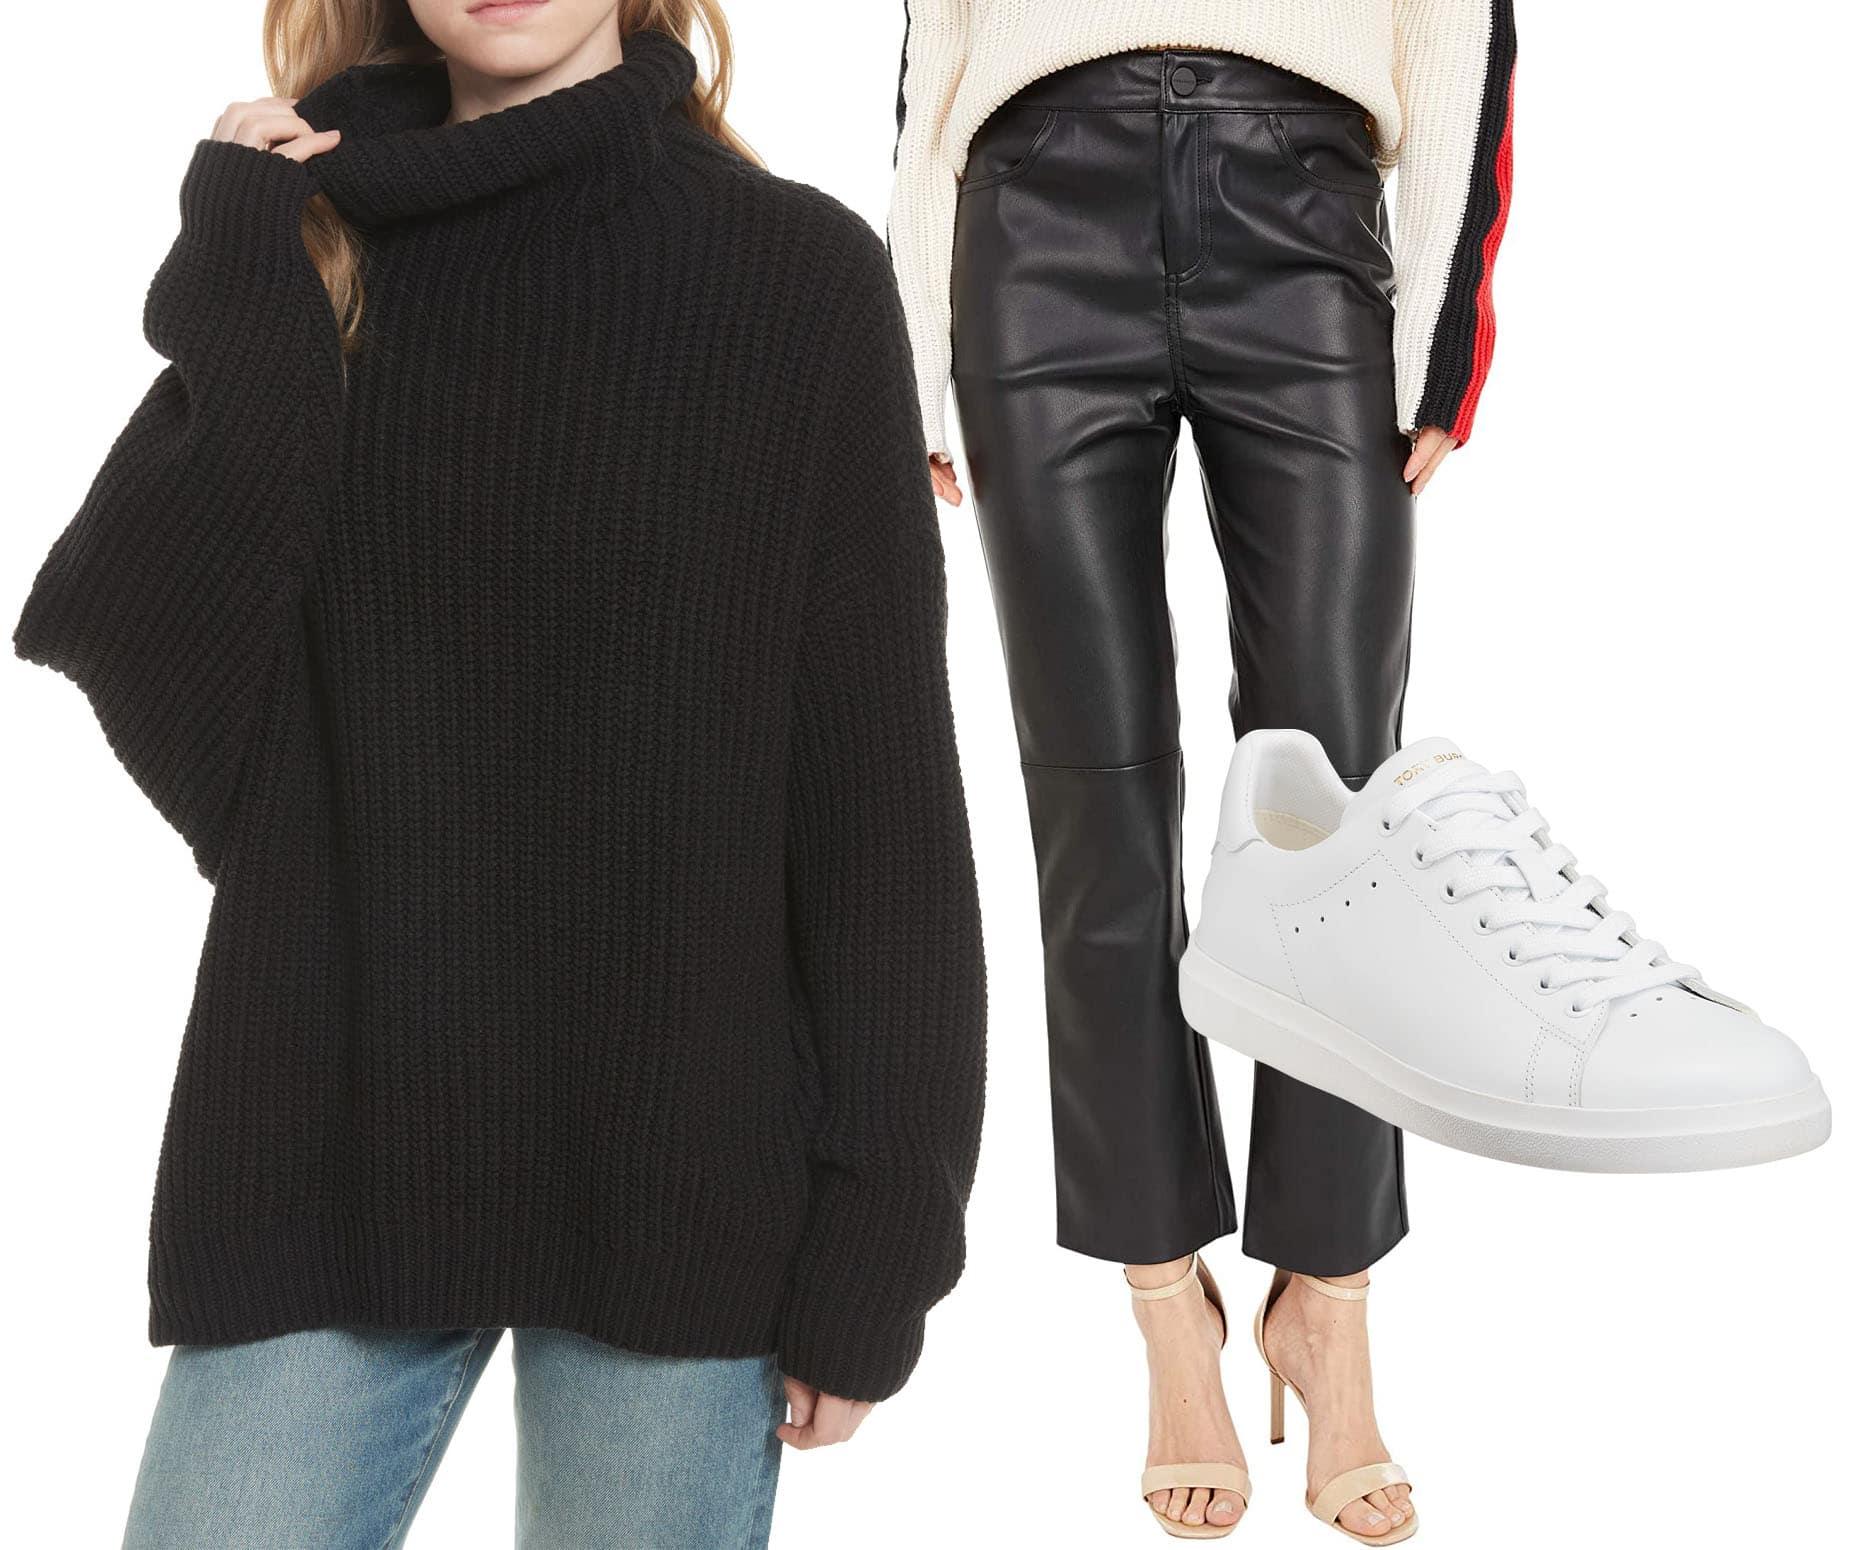 Free People Swim Too Deep Turtleneck Sweater, Sanctuary Leather Like Kick Crop Pants, Tory Burch Howell T-Saddle Court Sneakers